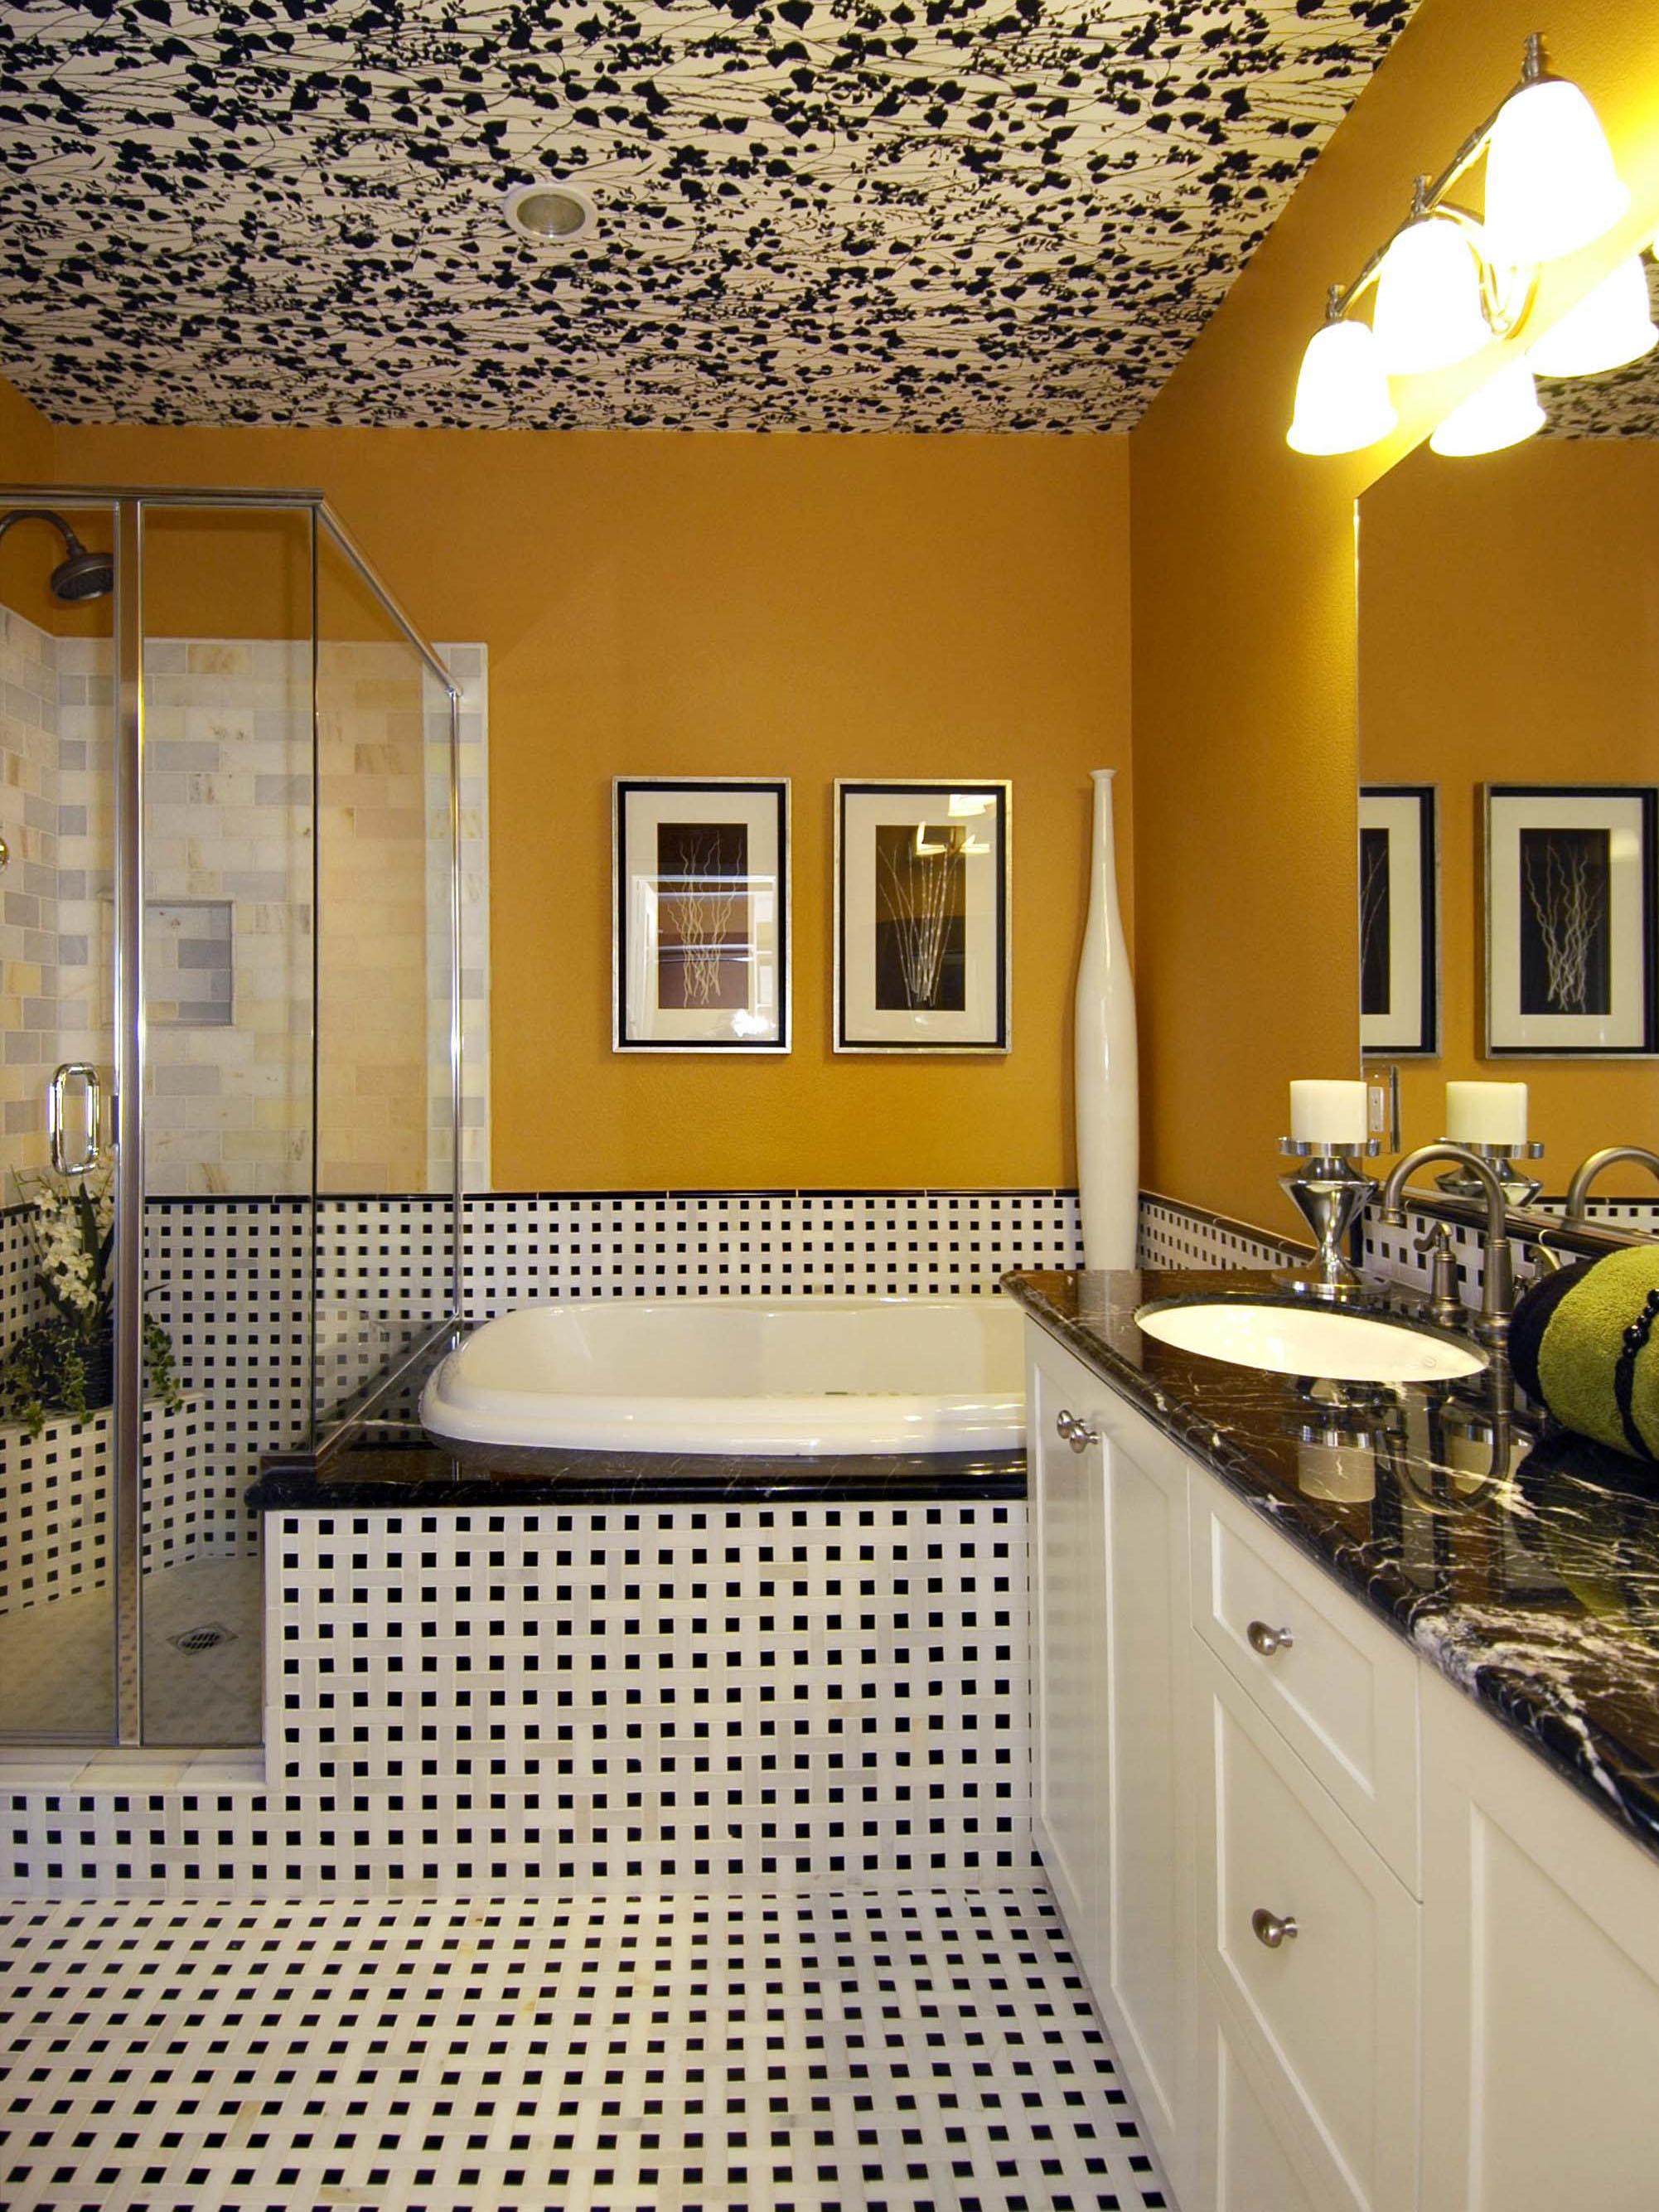 Amazing Roman Bath Store Toronto Small Choice Bathroom Shop Uk Clean Tile Backsplash In Bathroom Pictures Master Bath Remodel Plans Youthful Granite Bathroom Vanity Top Cost PinkMediterranean Style Bathroom Tiles Yellow Bathrooms: 7 Bright Ideas | HGTV